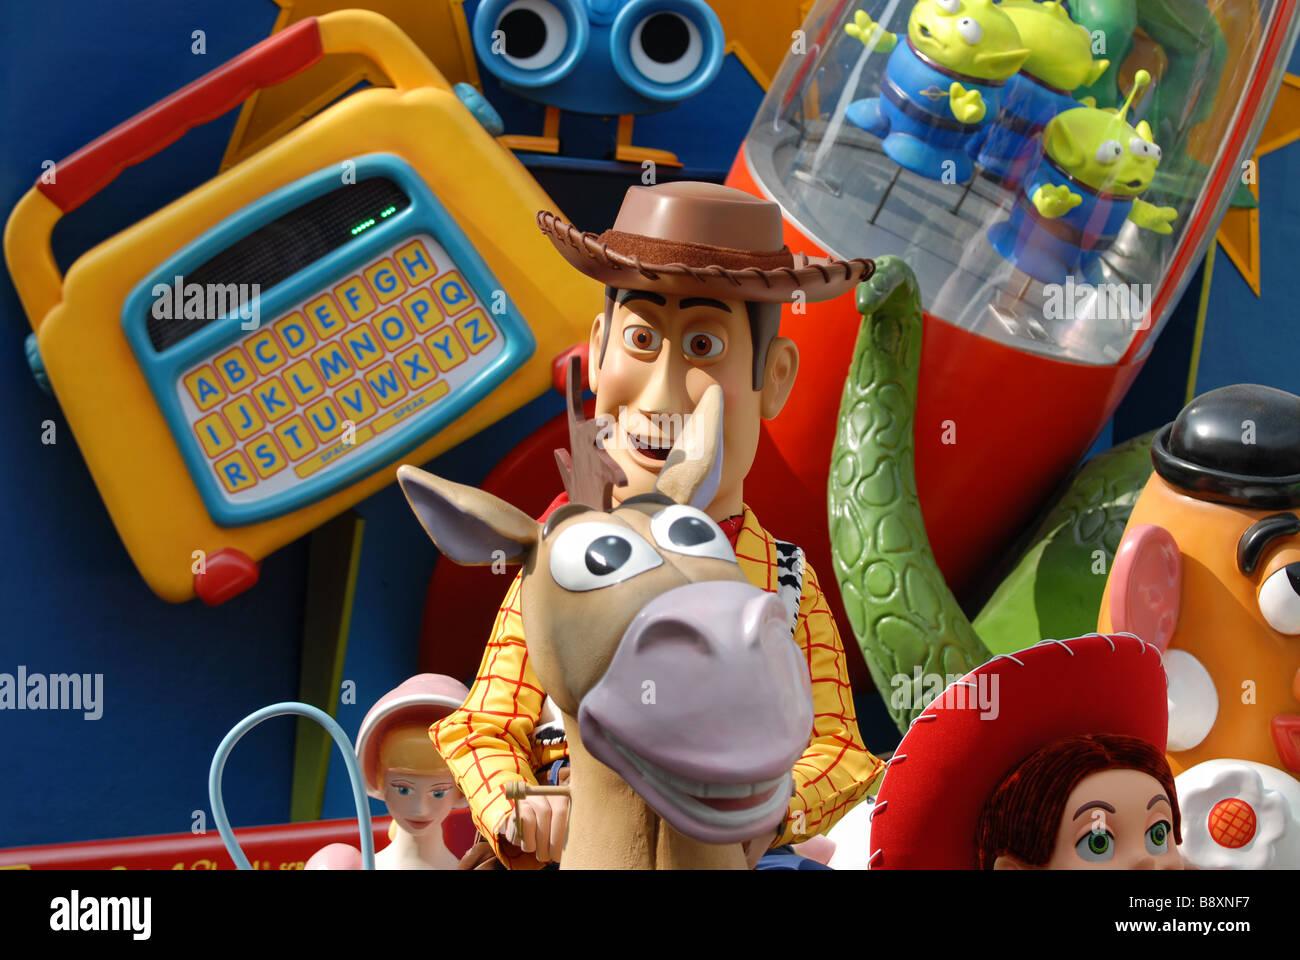 Toy Story Film Imagenes De Stock Toy Story Film Fotos De Stock Alamy